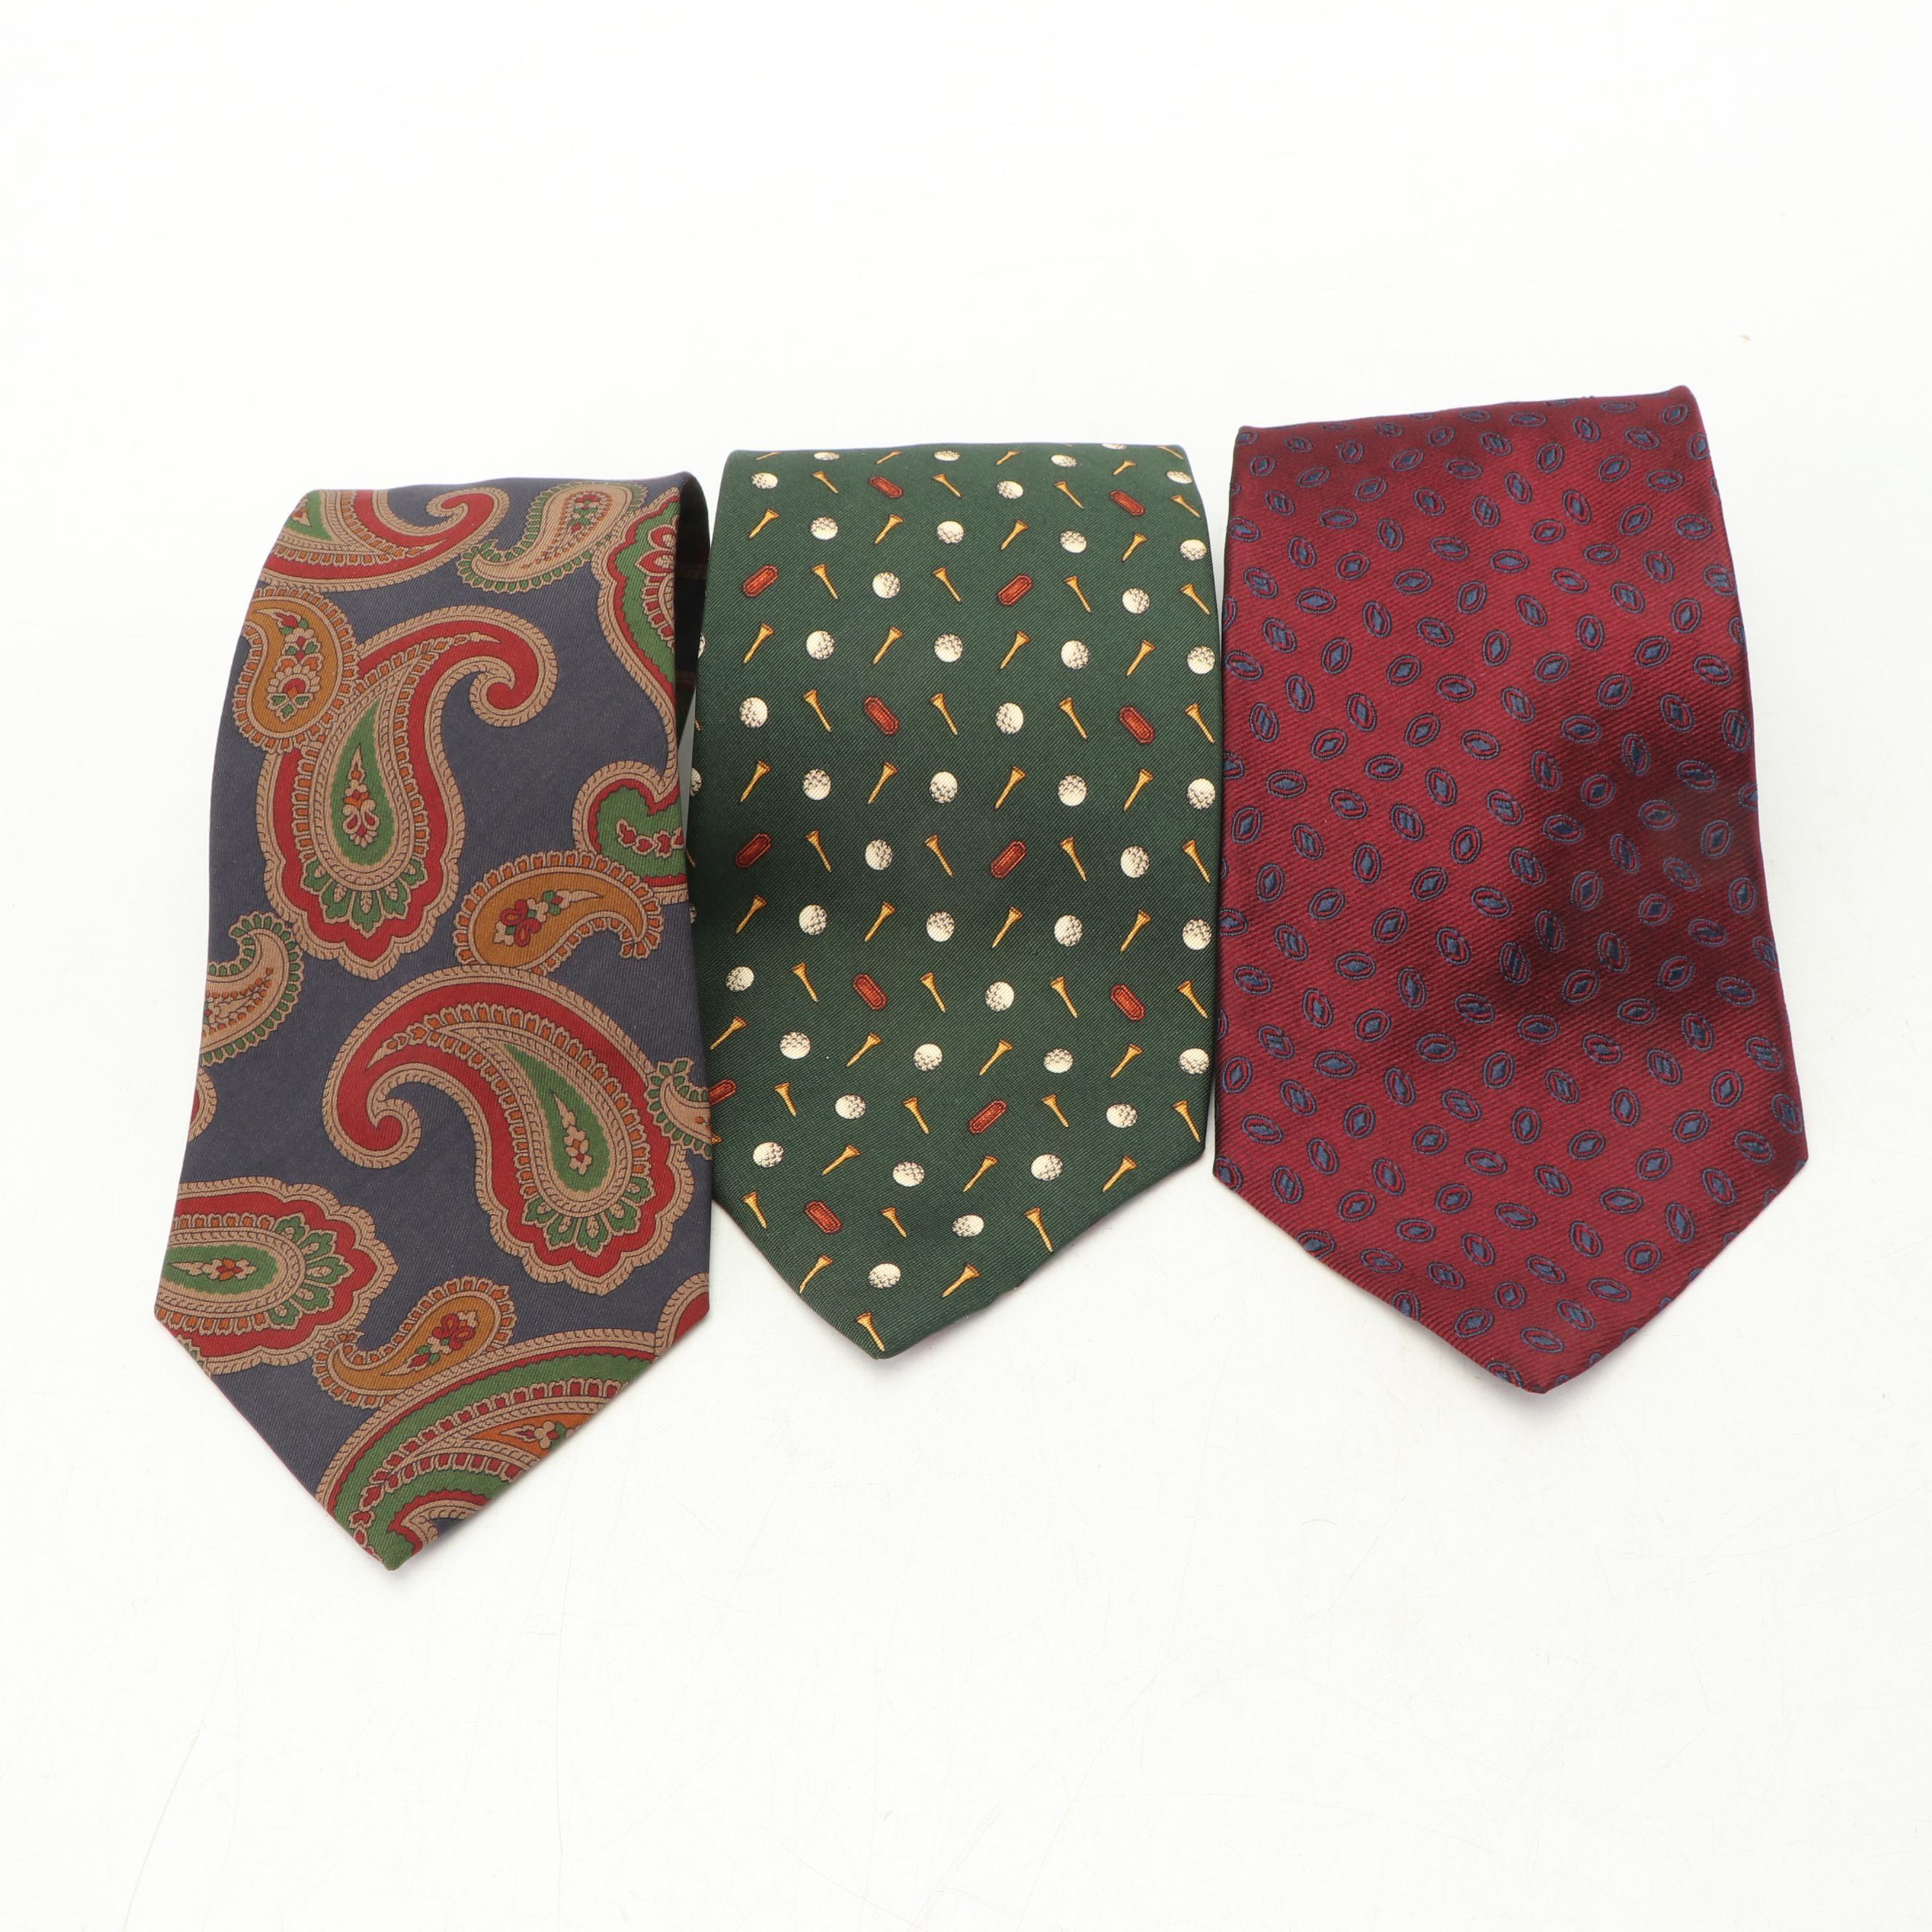 Coach and Karl Lagerfeld Silk Neckties